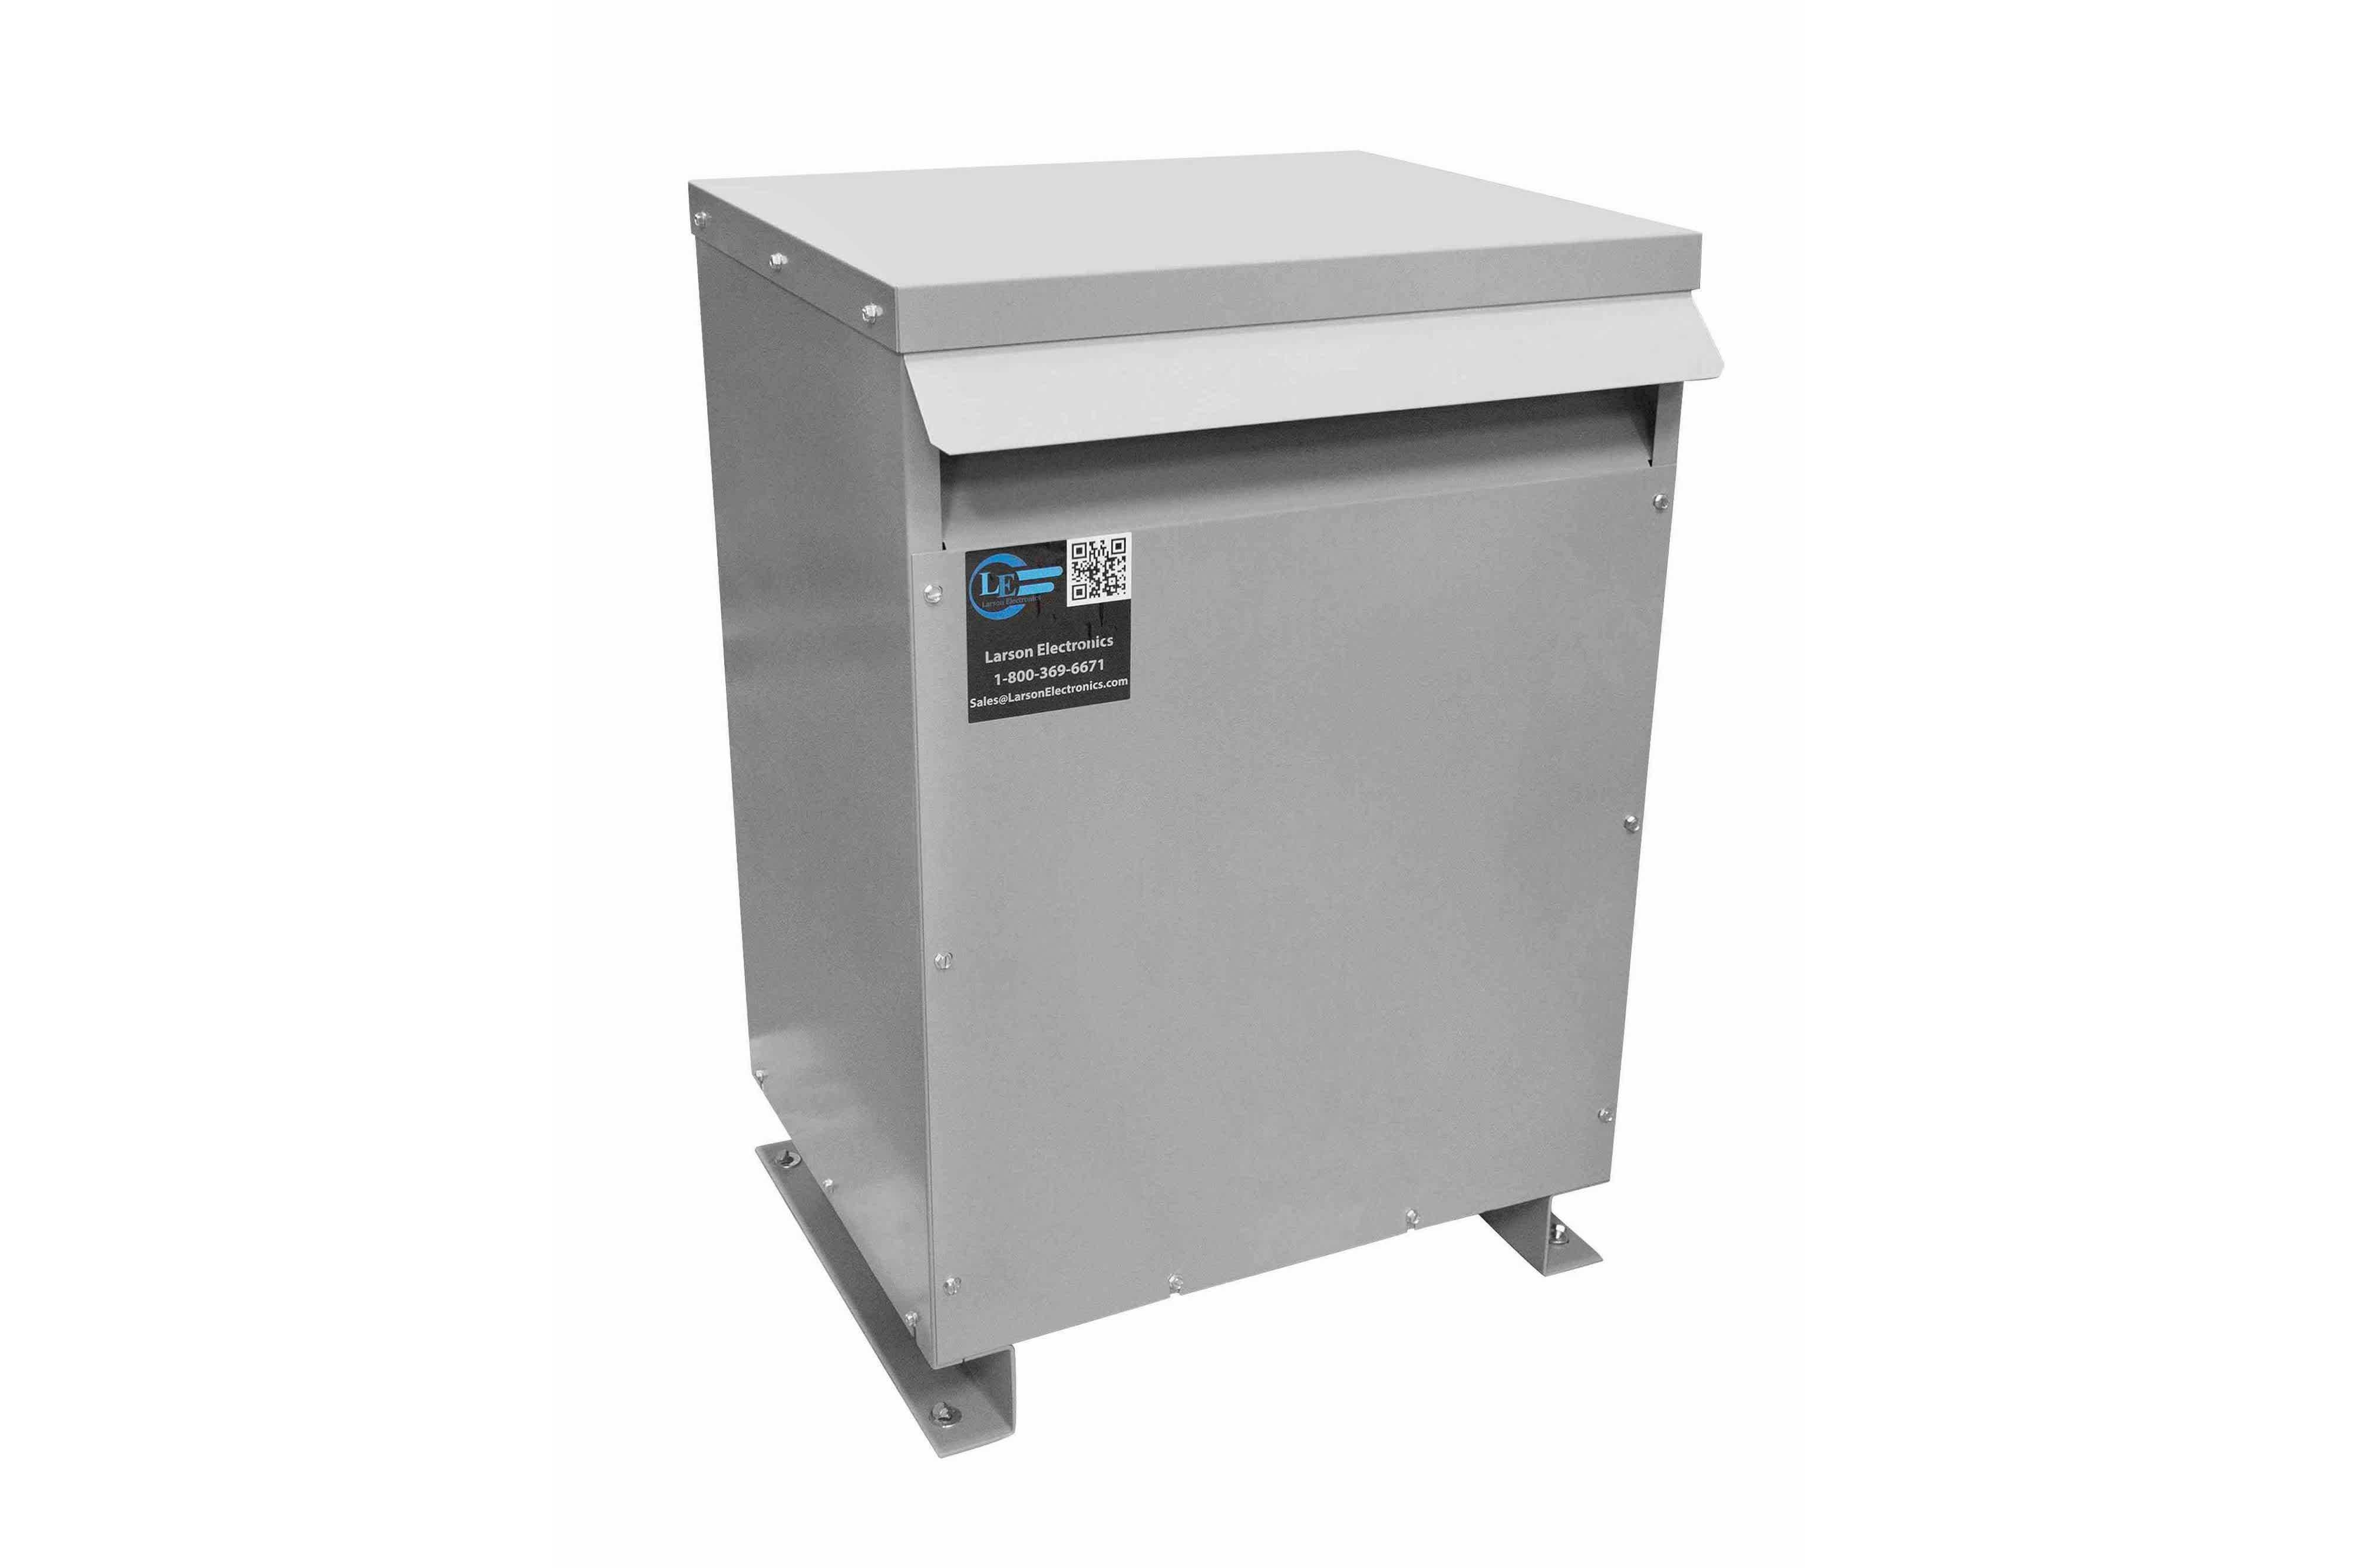 167 kVA 3PH Isolation Transformer, 380V Wye Primary, 208Y/120 Wye-N Secondary, N3R, Ventilated, 60 Hz